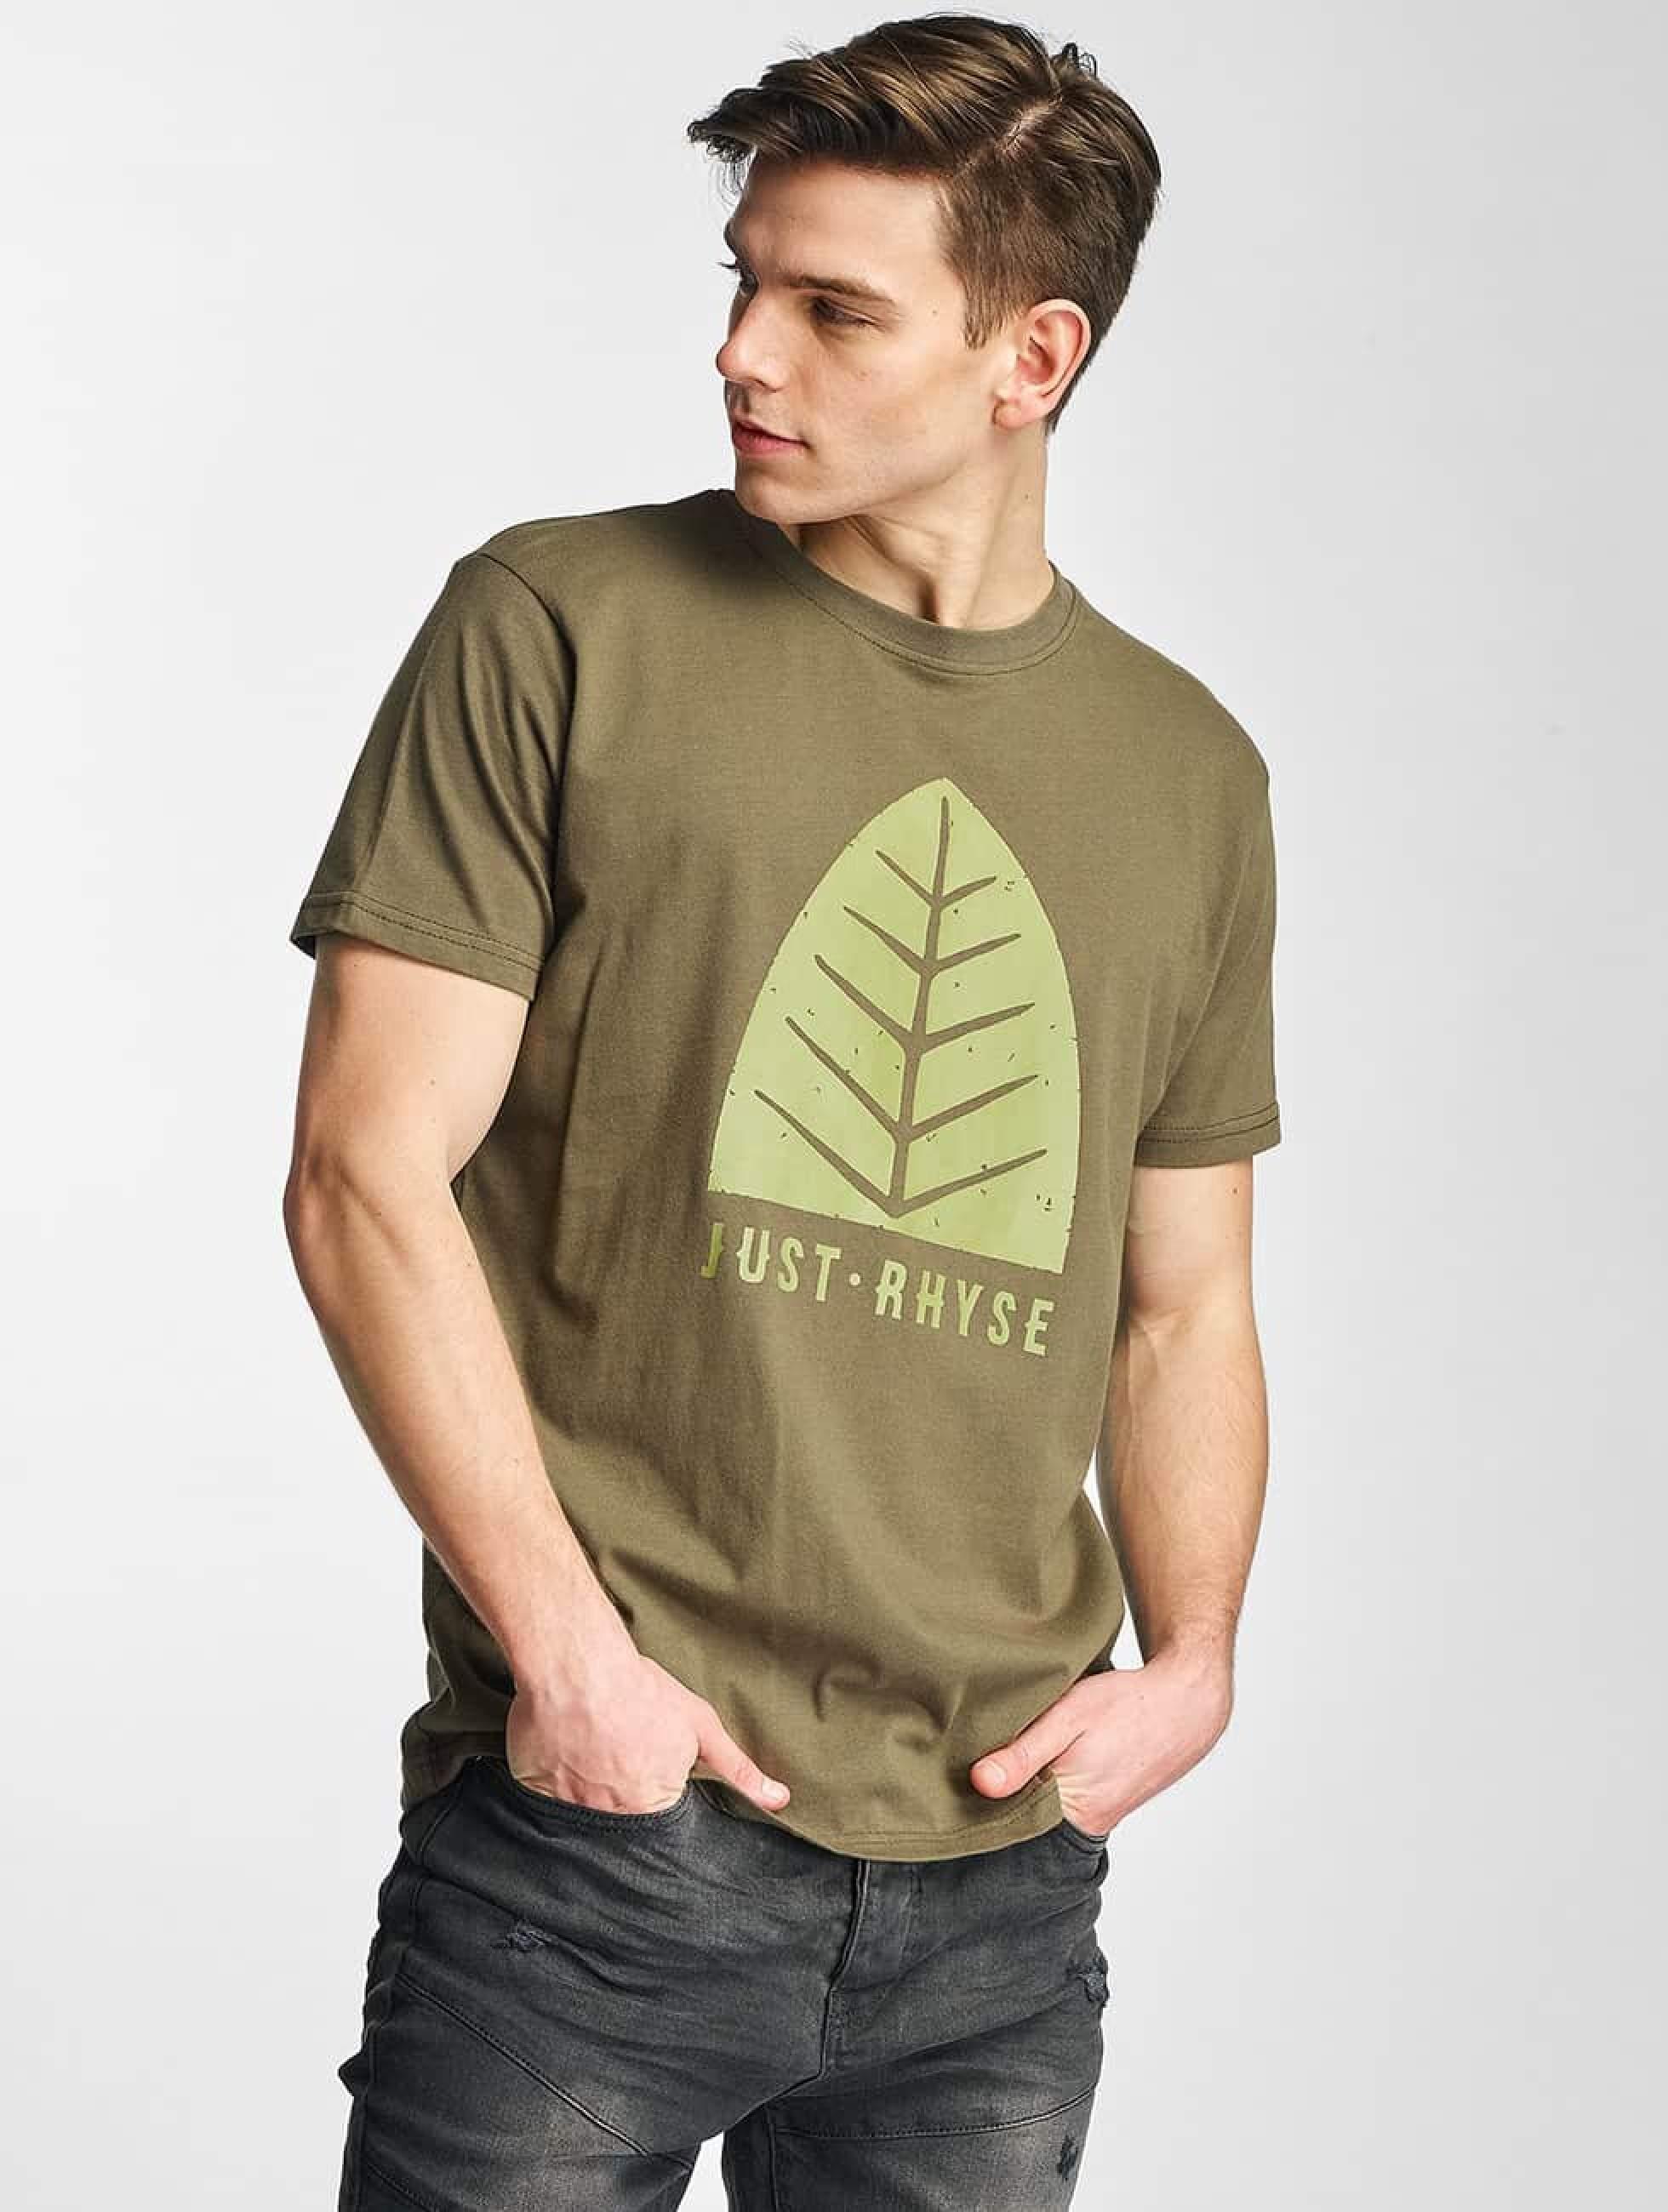 Just Rhyse / T-Shirt Monterey in khaki S